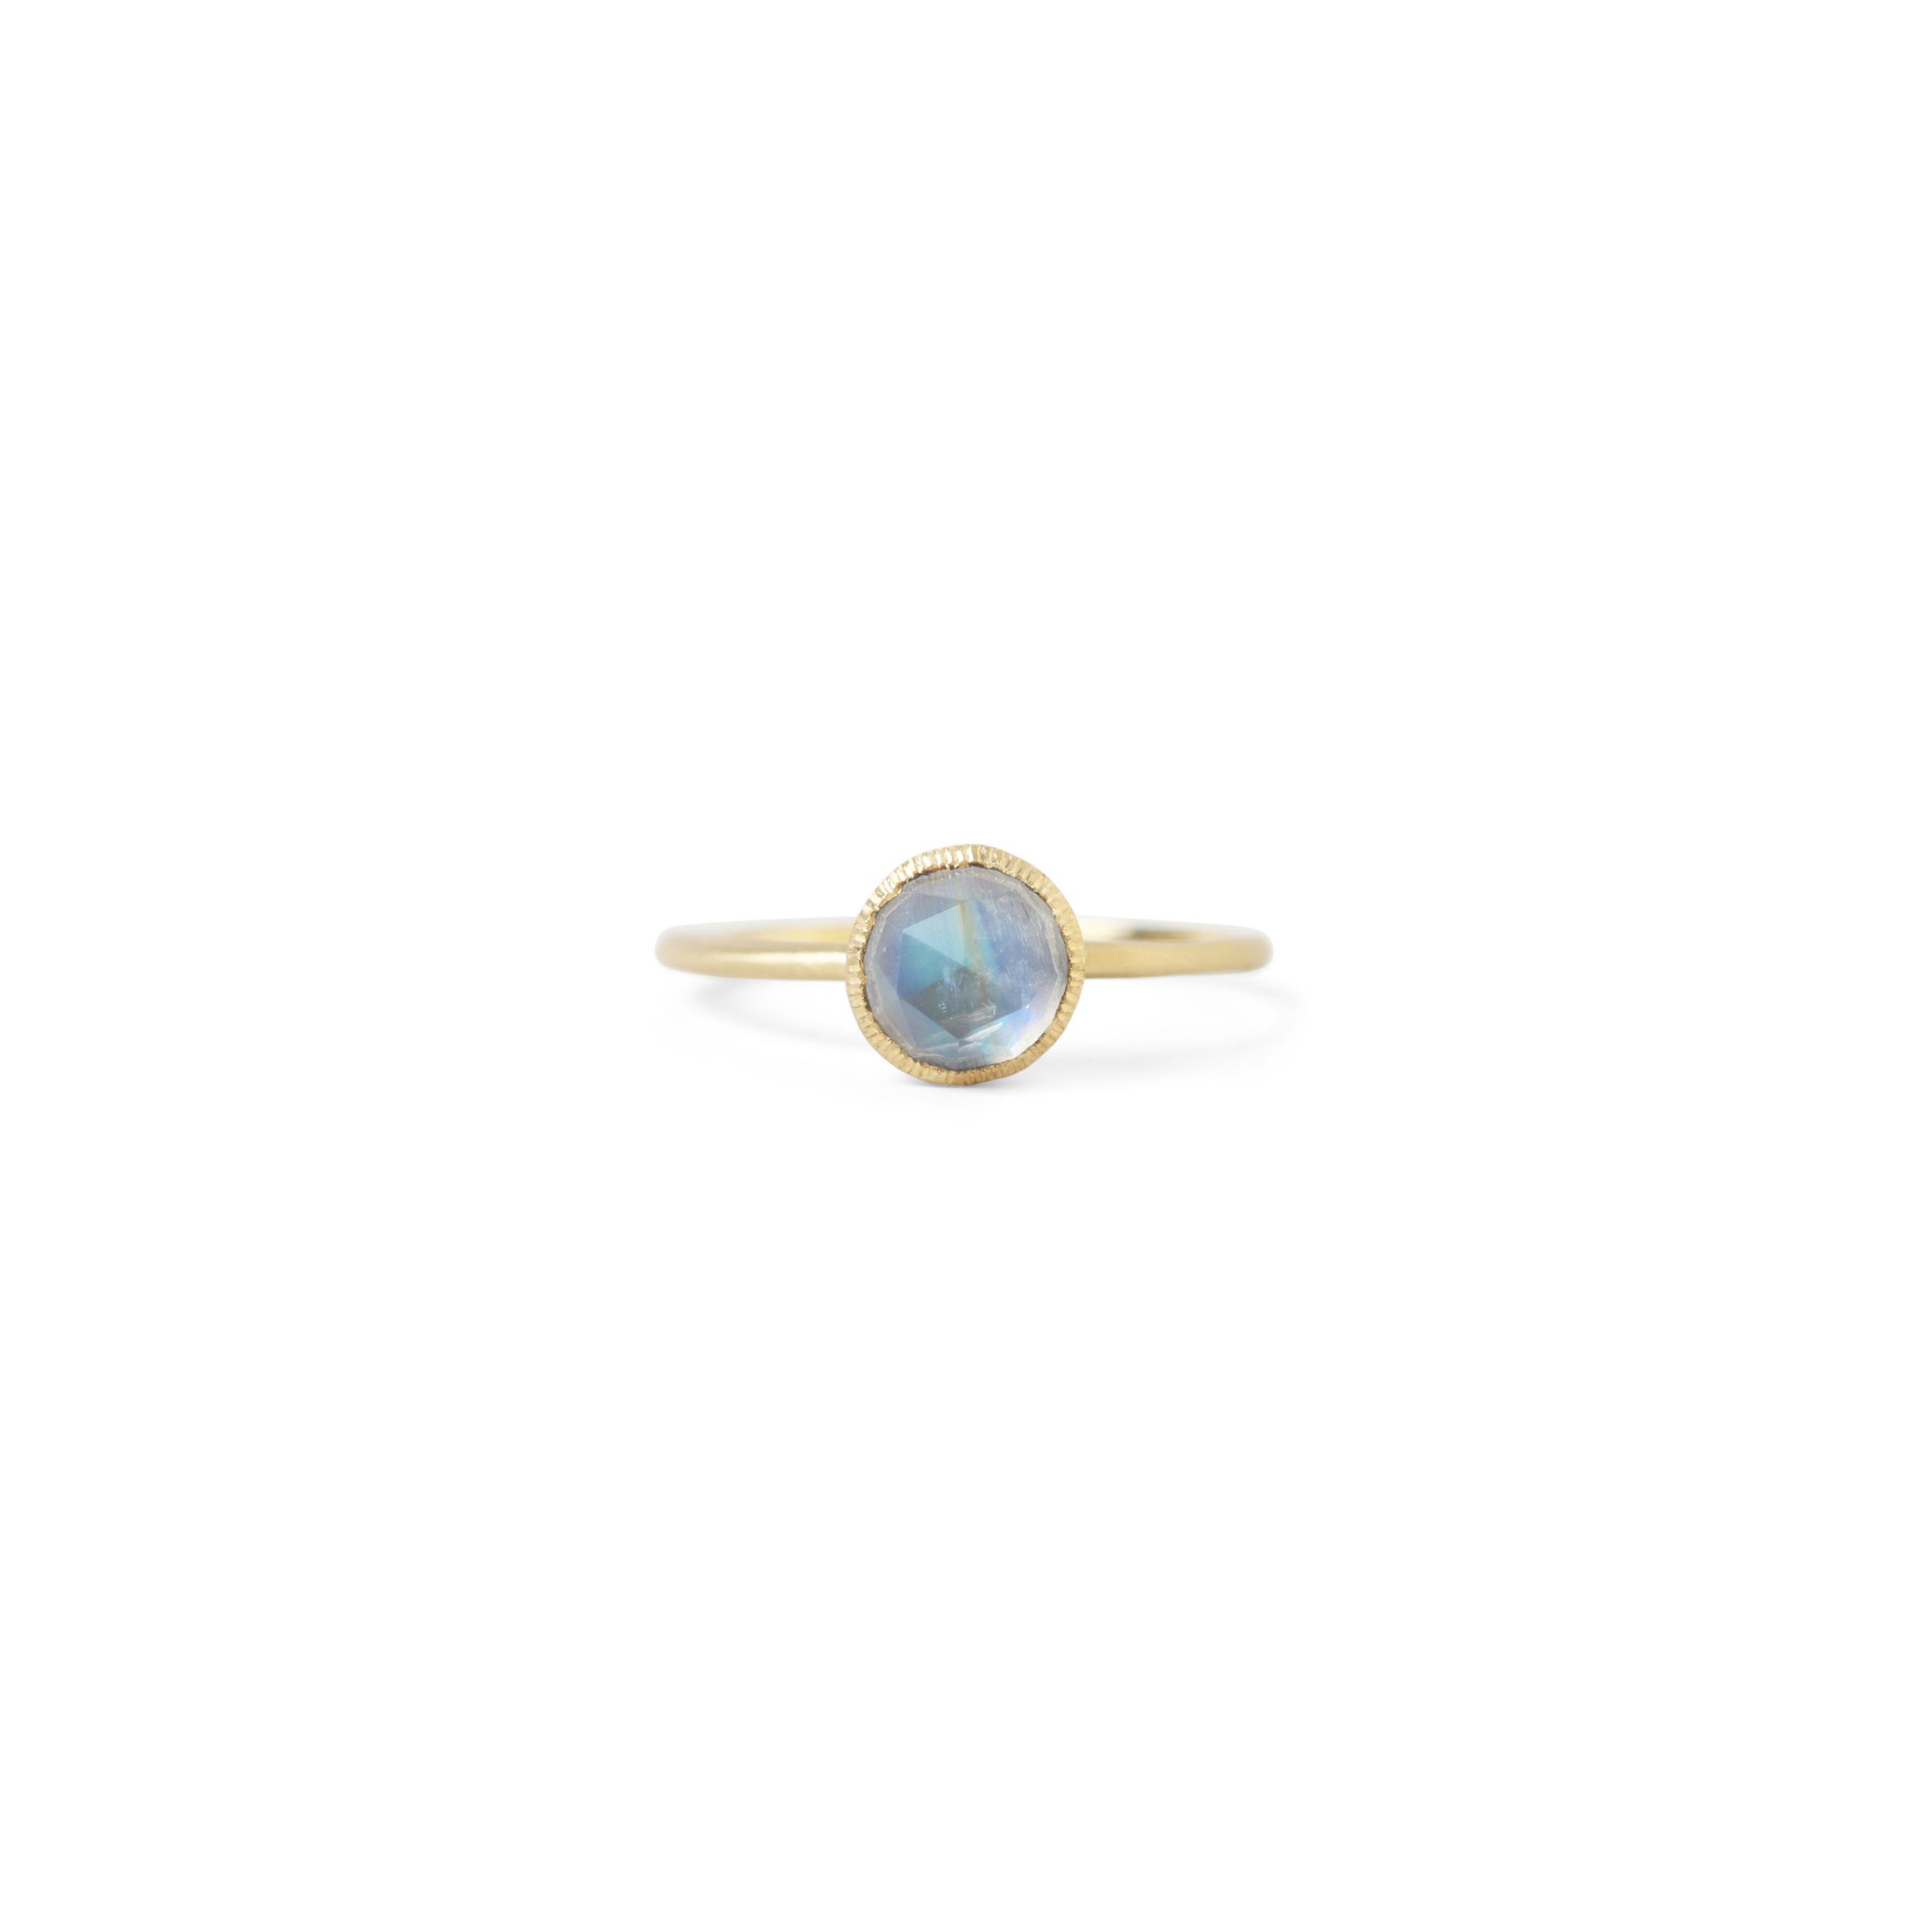 Moonstone Engagement Ring, Satomi Kawakita